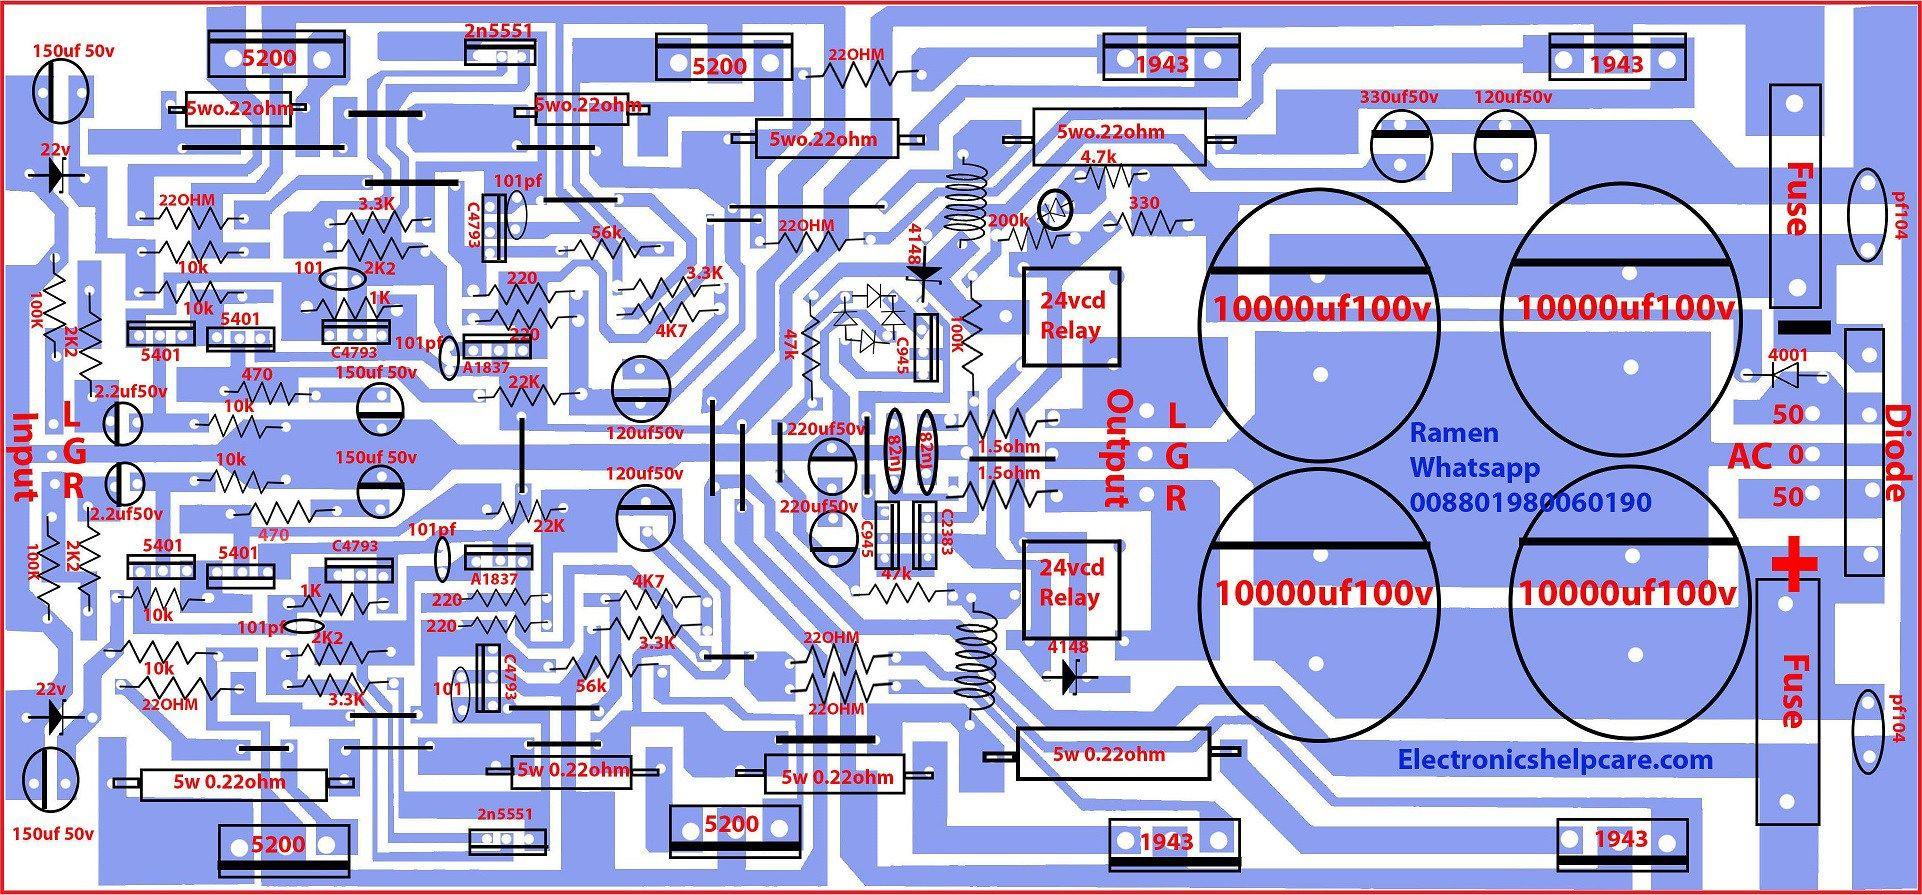 Audio Transistor Circuit Diagrams Wiring Schematics Diagram Of 2sa1943 And 2sc5200 1001 10000